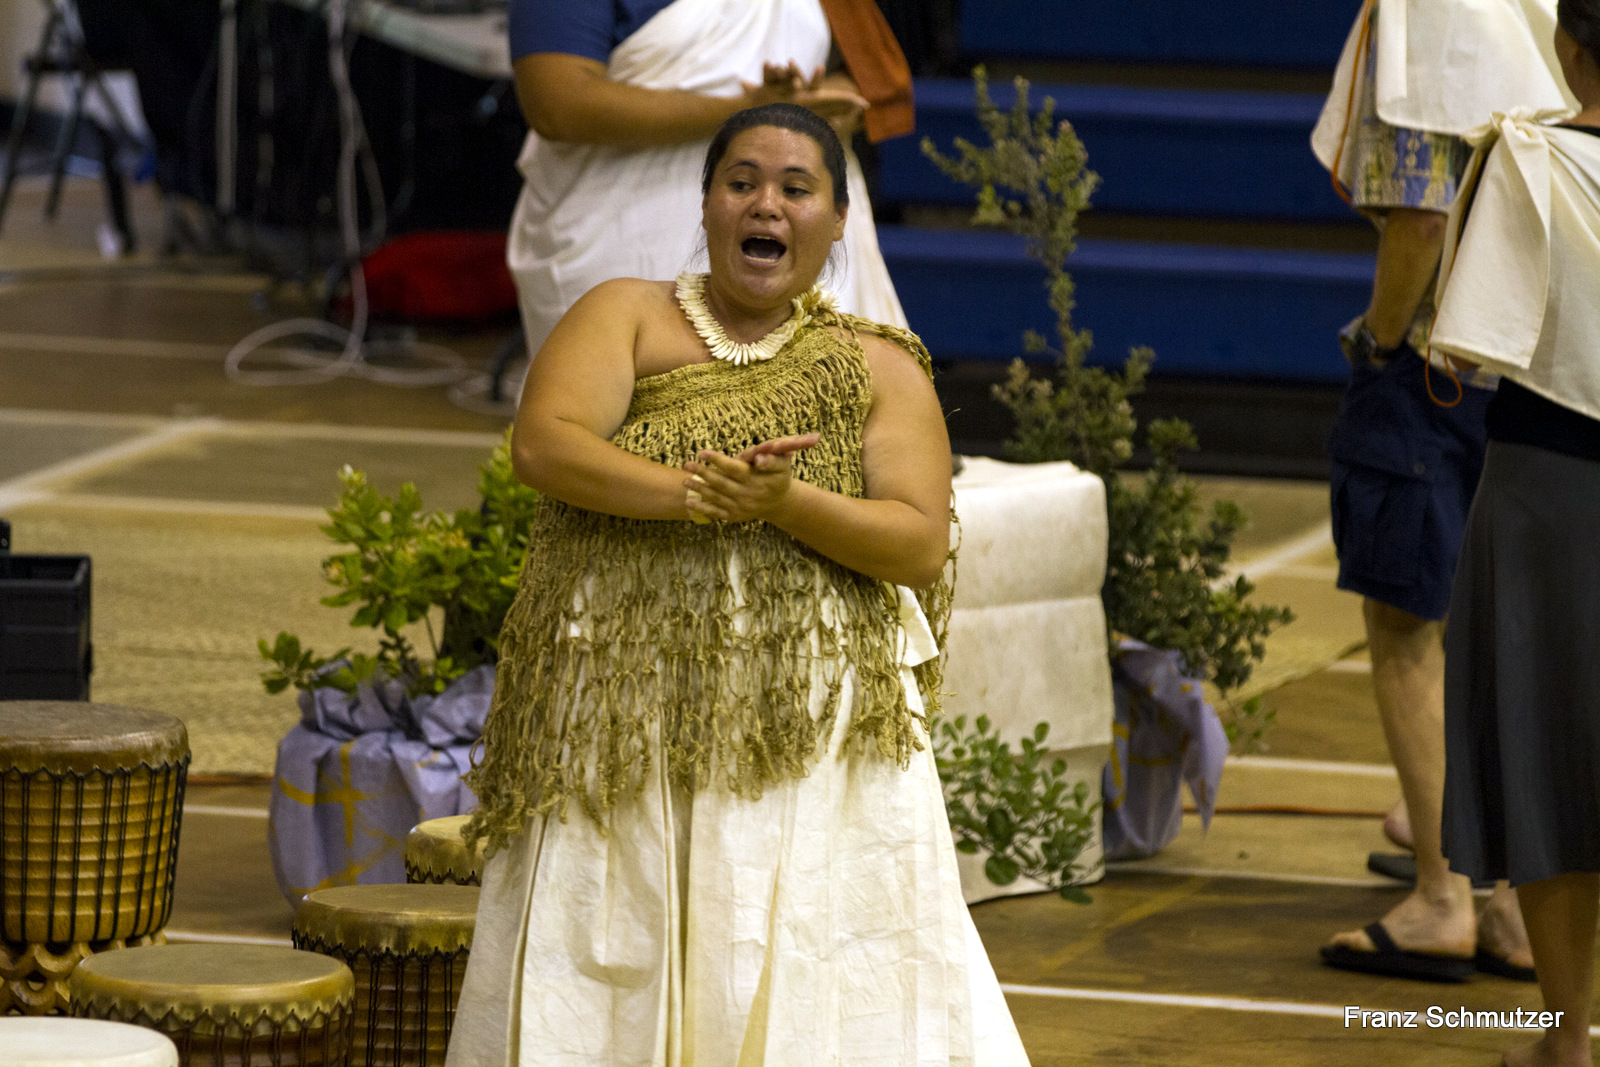 Kipaepae dancer in traditional kihei attire., chants